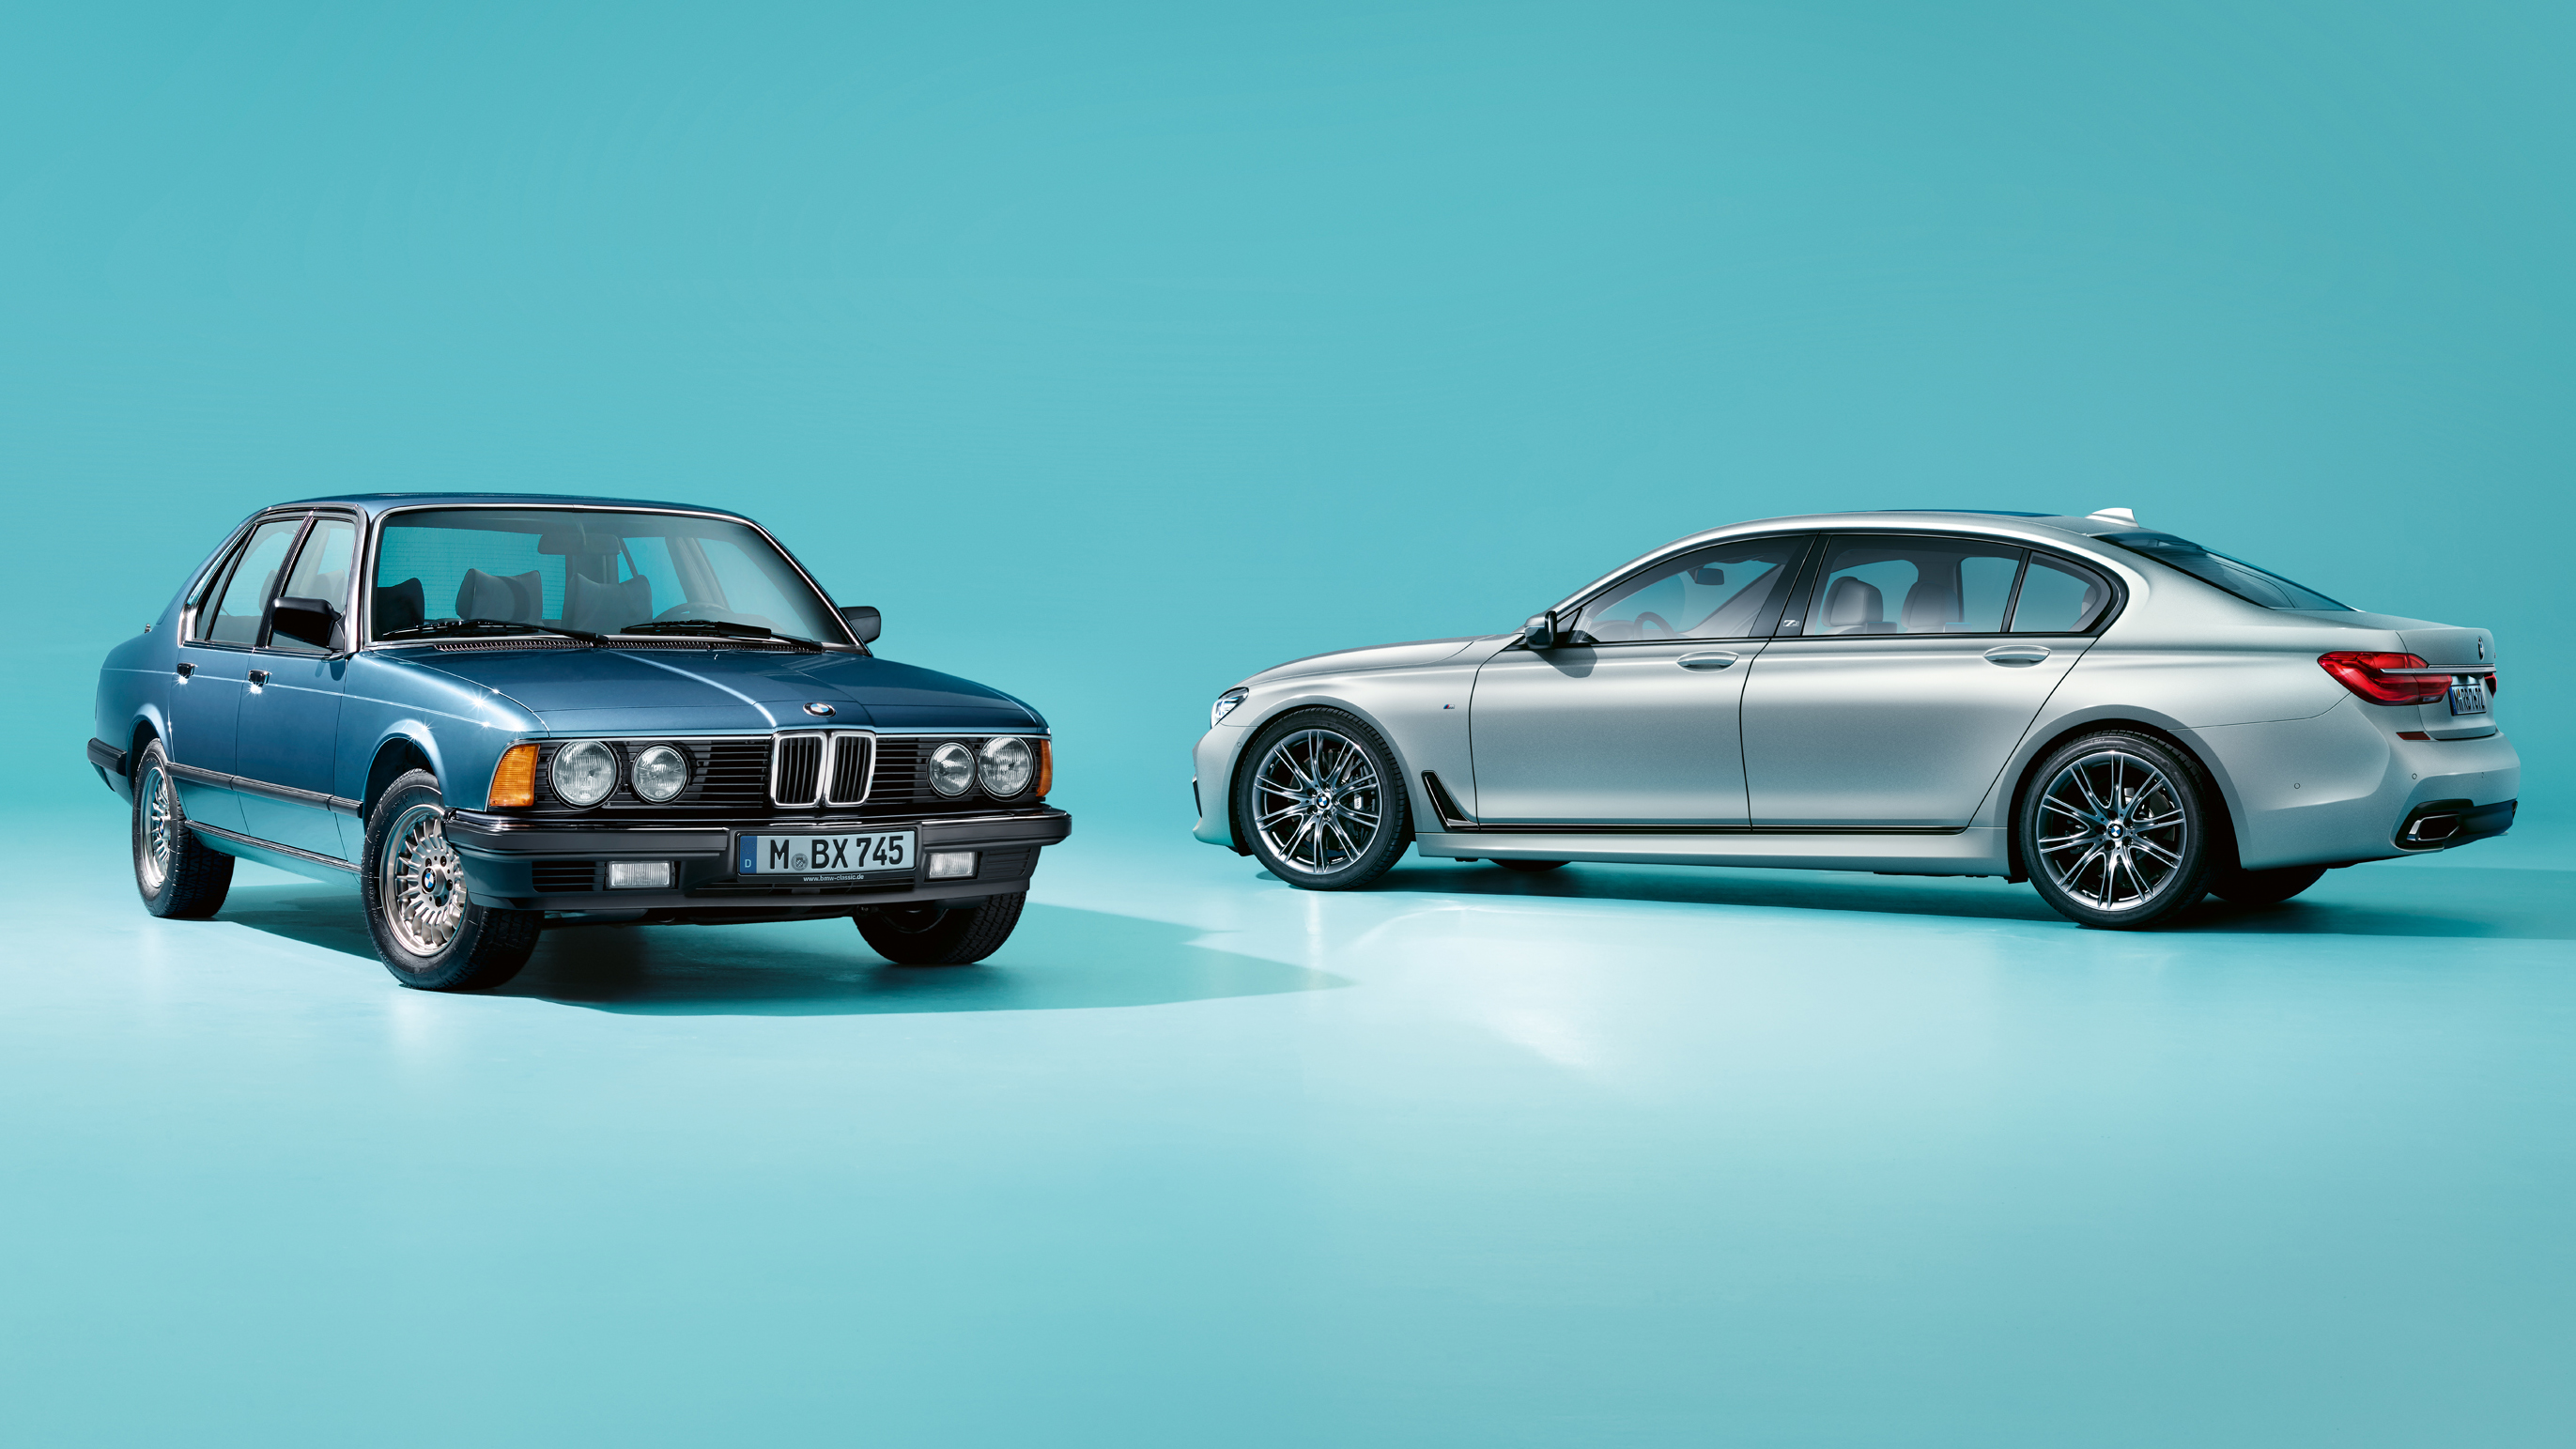 BMW 7 Series, old vs new photo